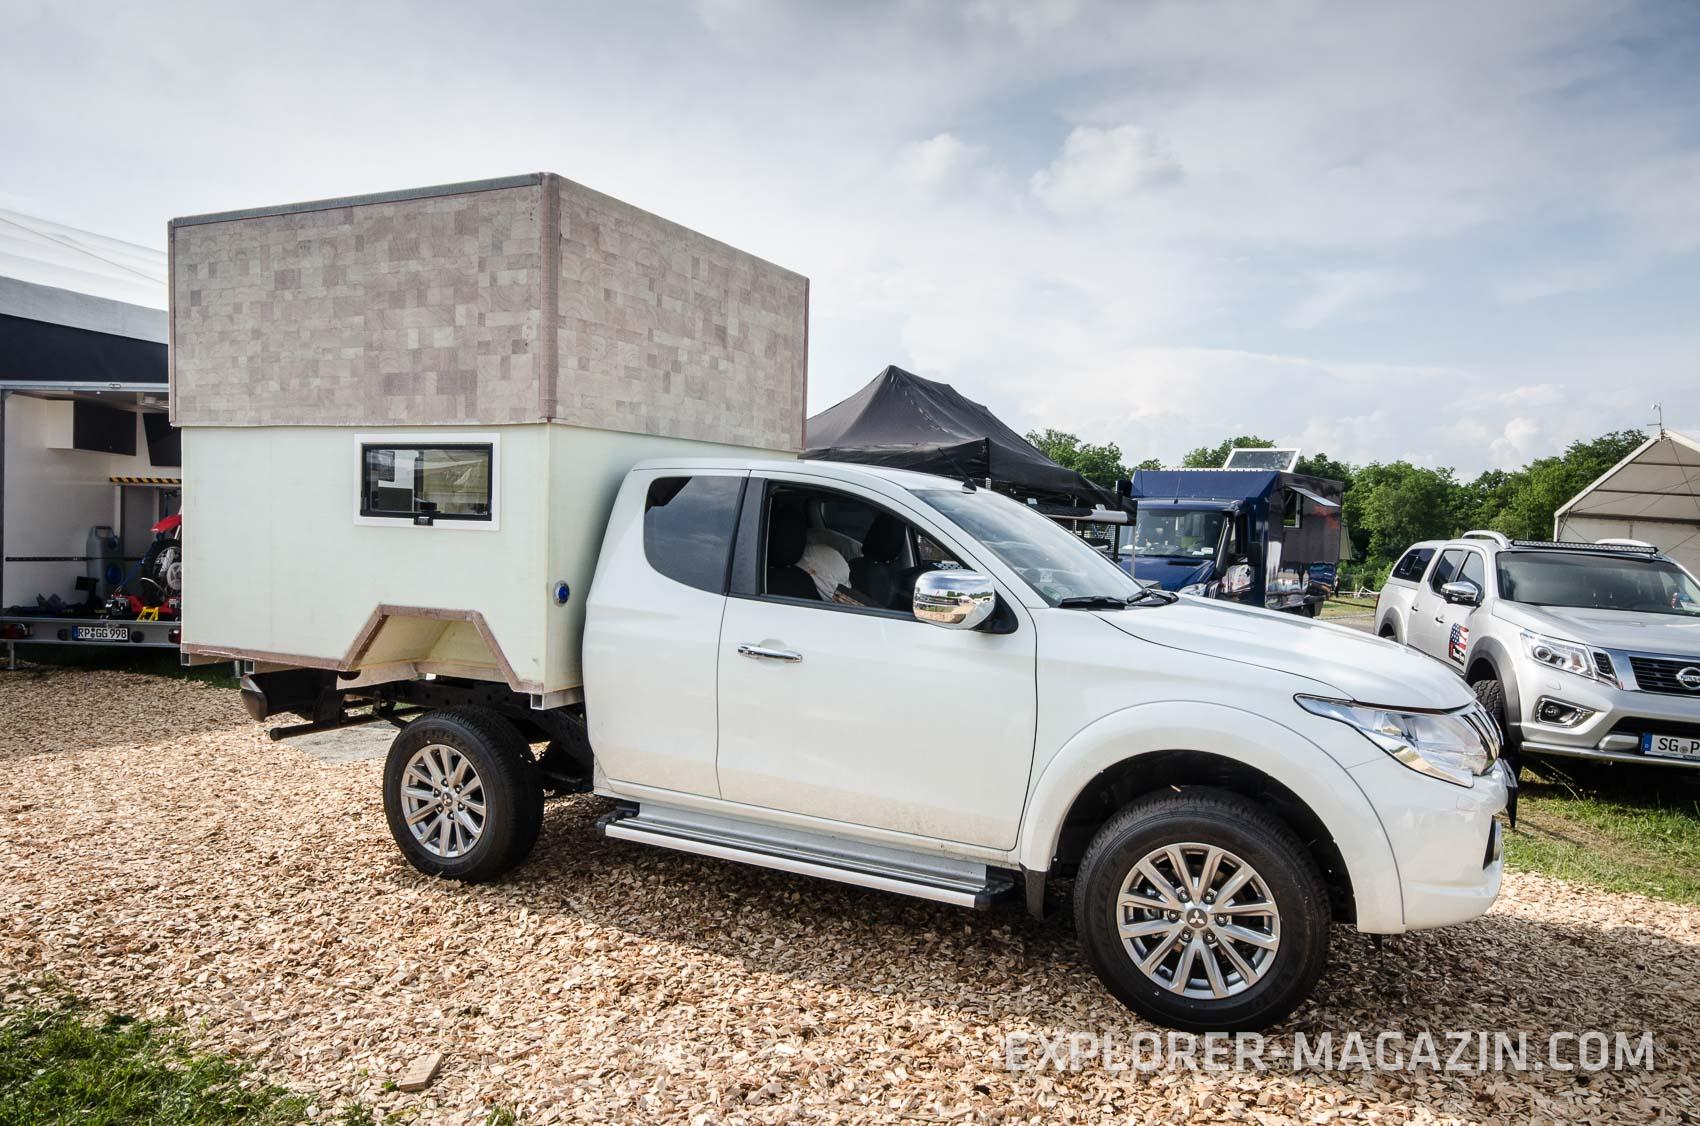 pickup kabine selbst bauen ursa minor ein projekt des. Black Bedroom Furniture Sets. Home Design Ideas